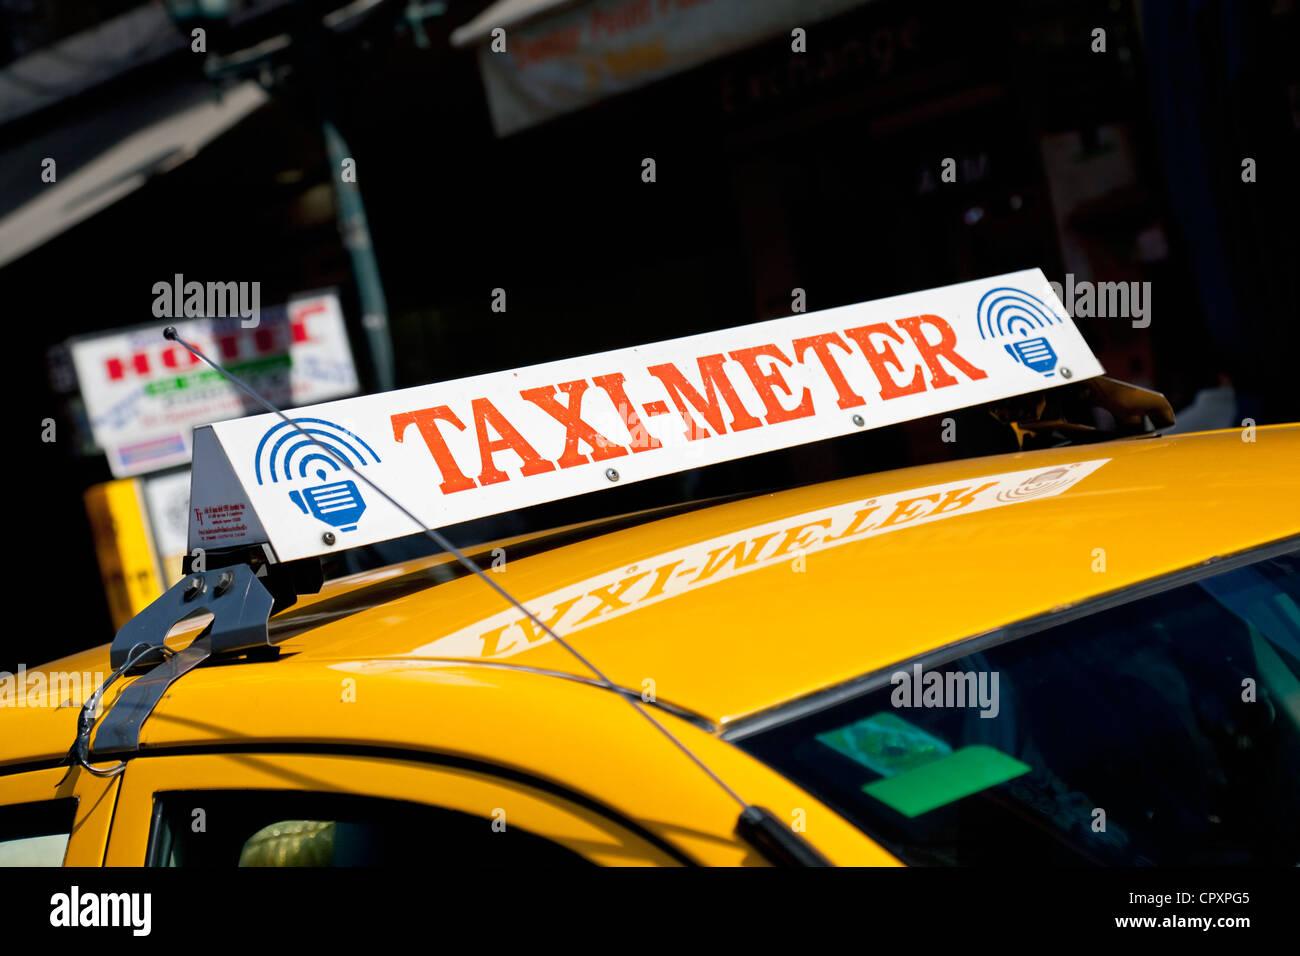 'Taxi-Meter' (Detail), Thanon Khao San (Khao San Road, Banglamphu, Bangkok, Thailand - Stock Image